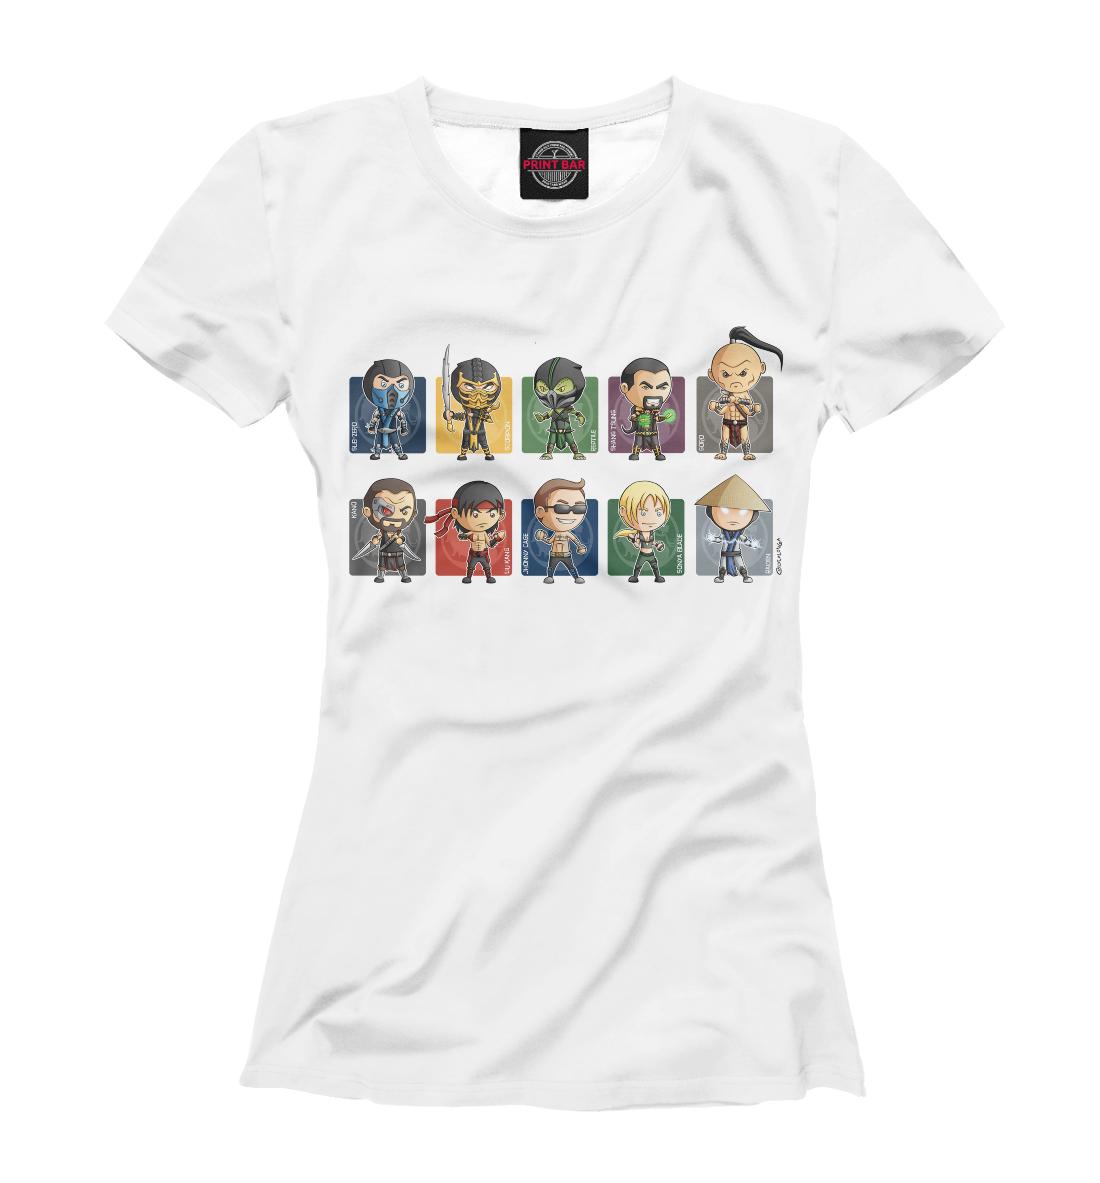 Купить Mortal Kombat Heroes, Printbar, Футболки, MKB-698428-fut-1